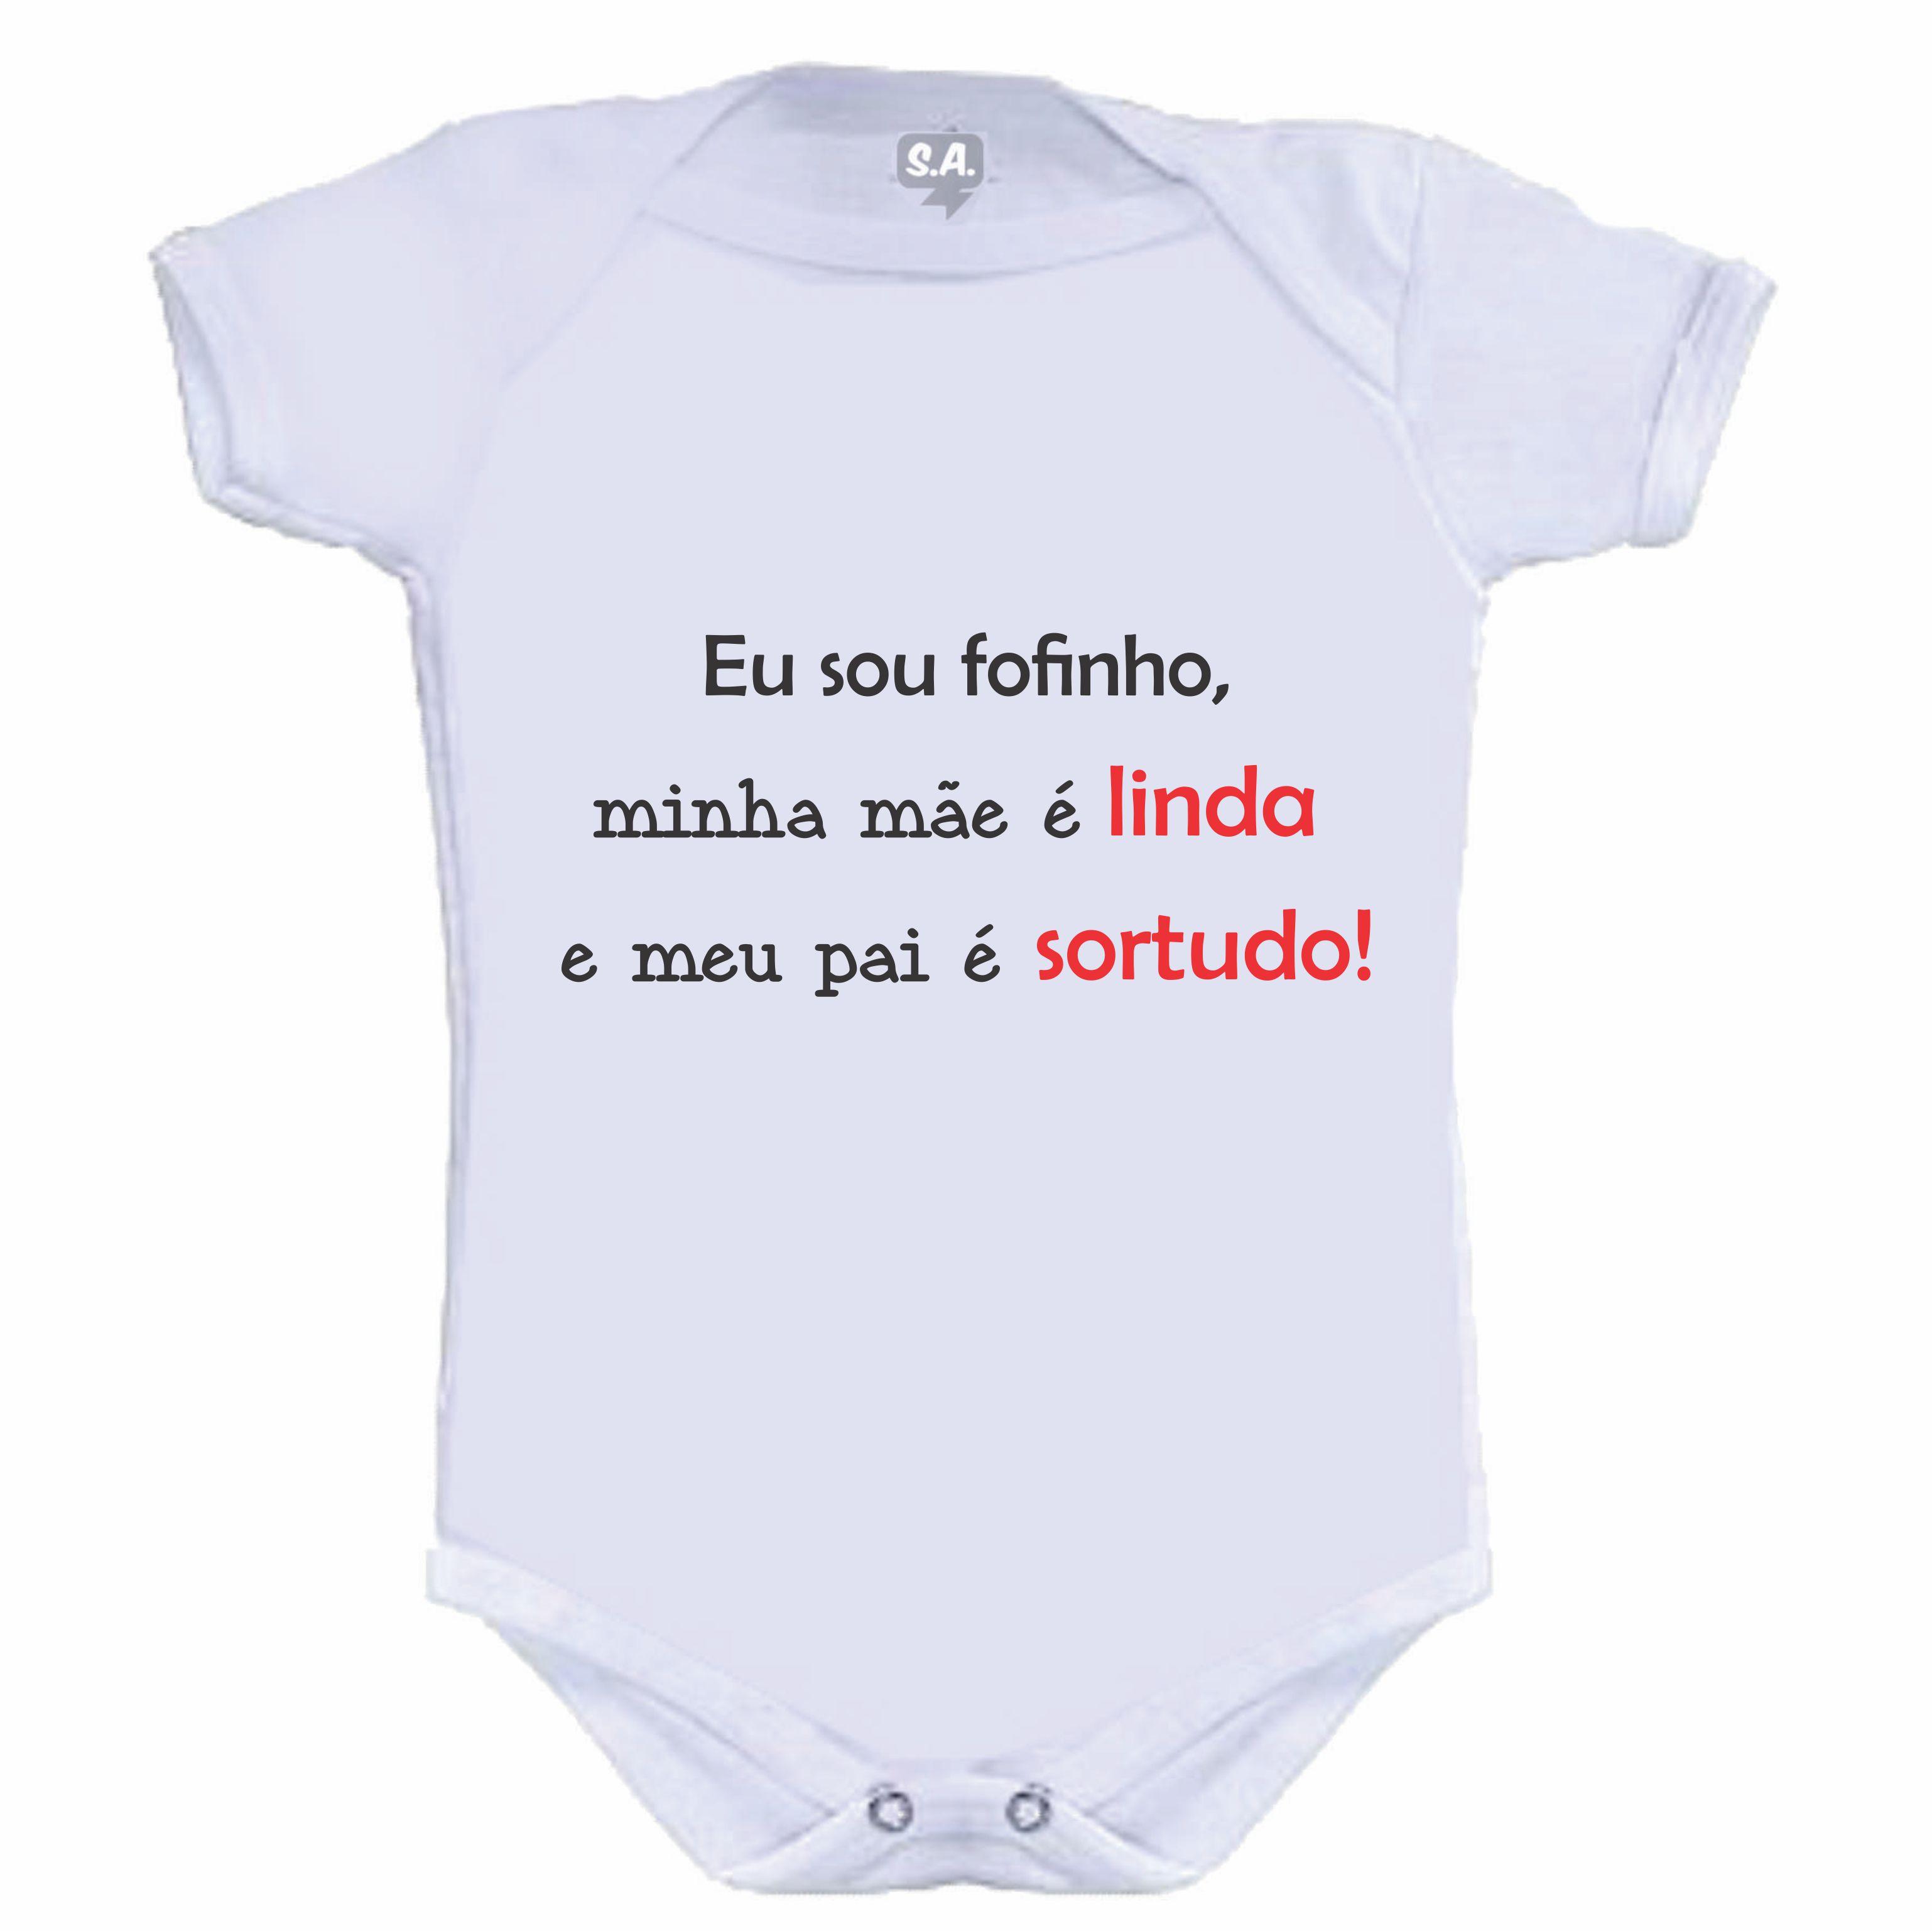 Body Infantil Meu Pai Sempre Será Meu Rei  be7a3d909cc23